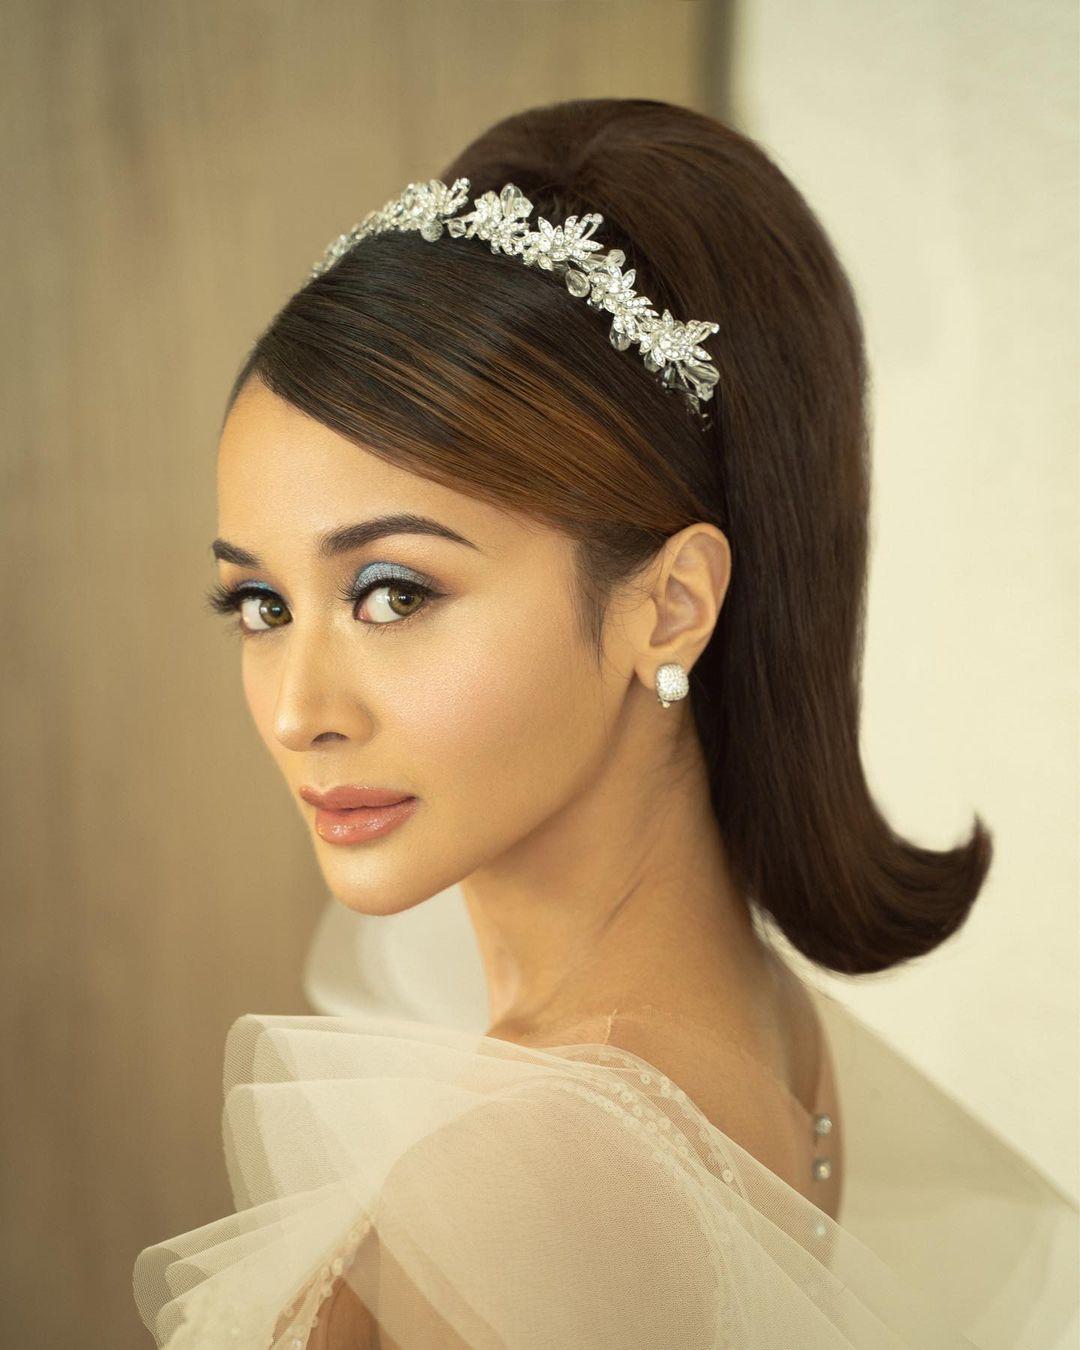 kris bernal and perry choi wedding highlights